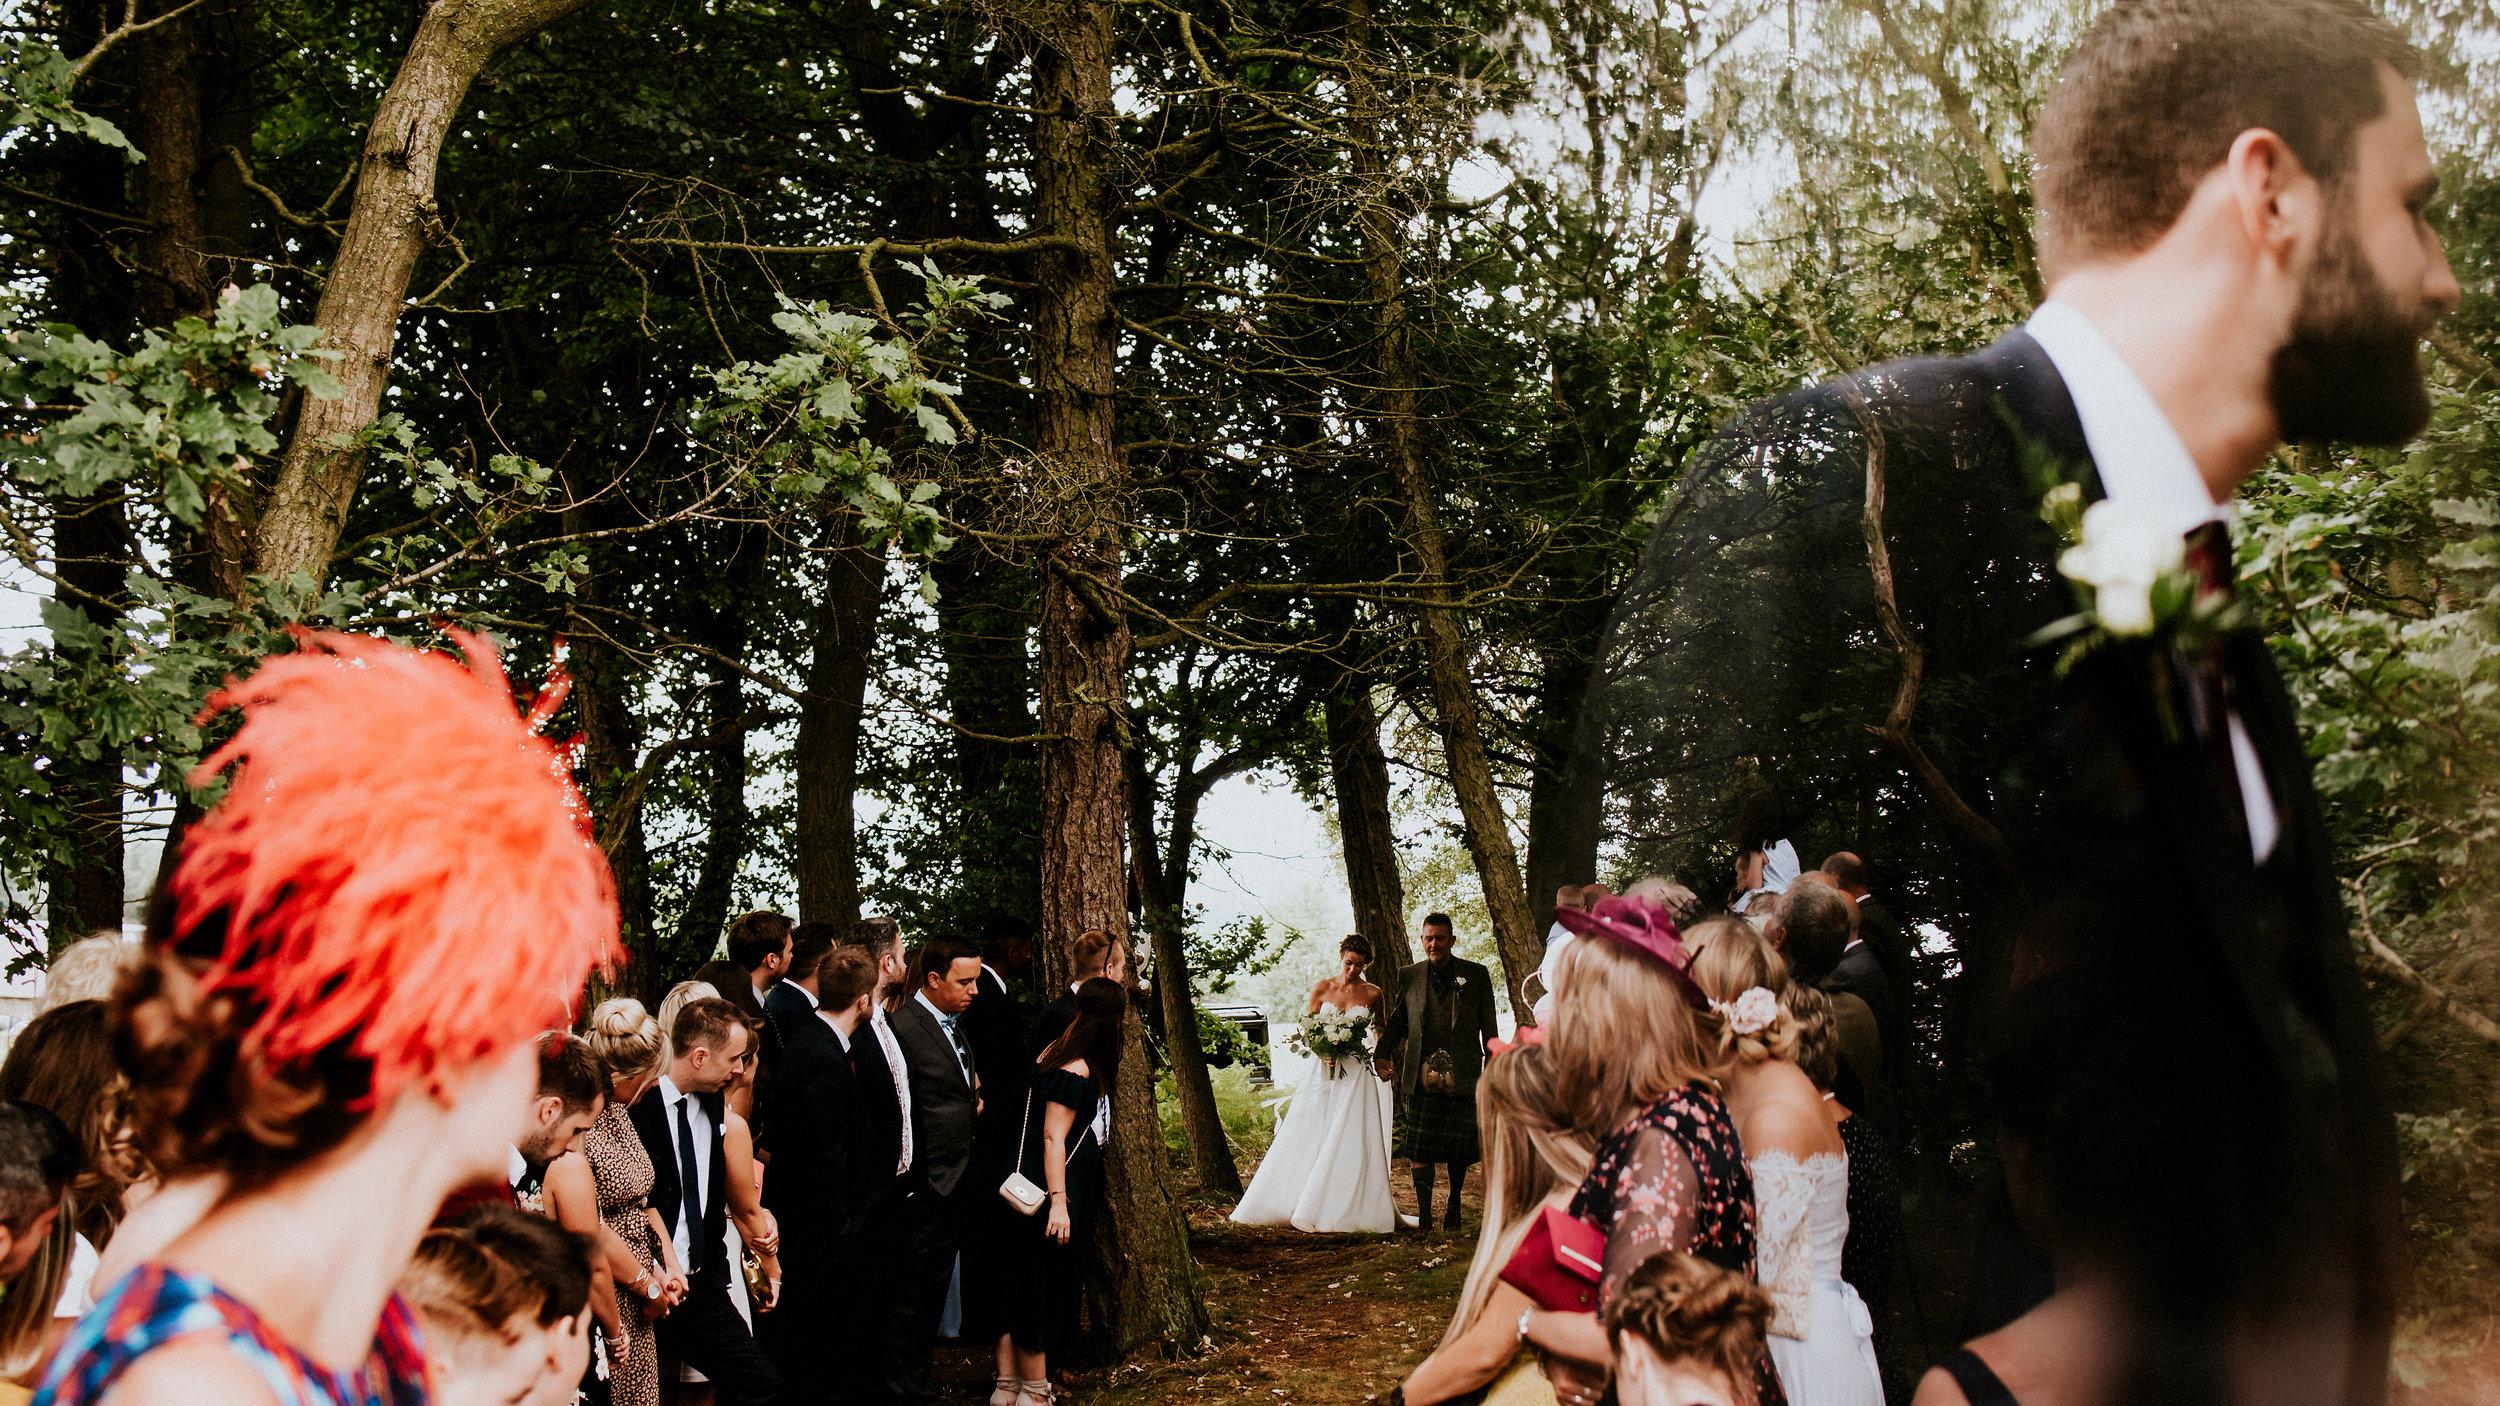 Brimham-Rocks-Summerbridge-Outdoor-Teep-Wedding-In-the-Woods-Shutter-Go-Click-30.jpg